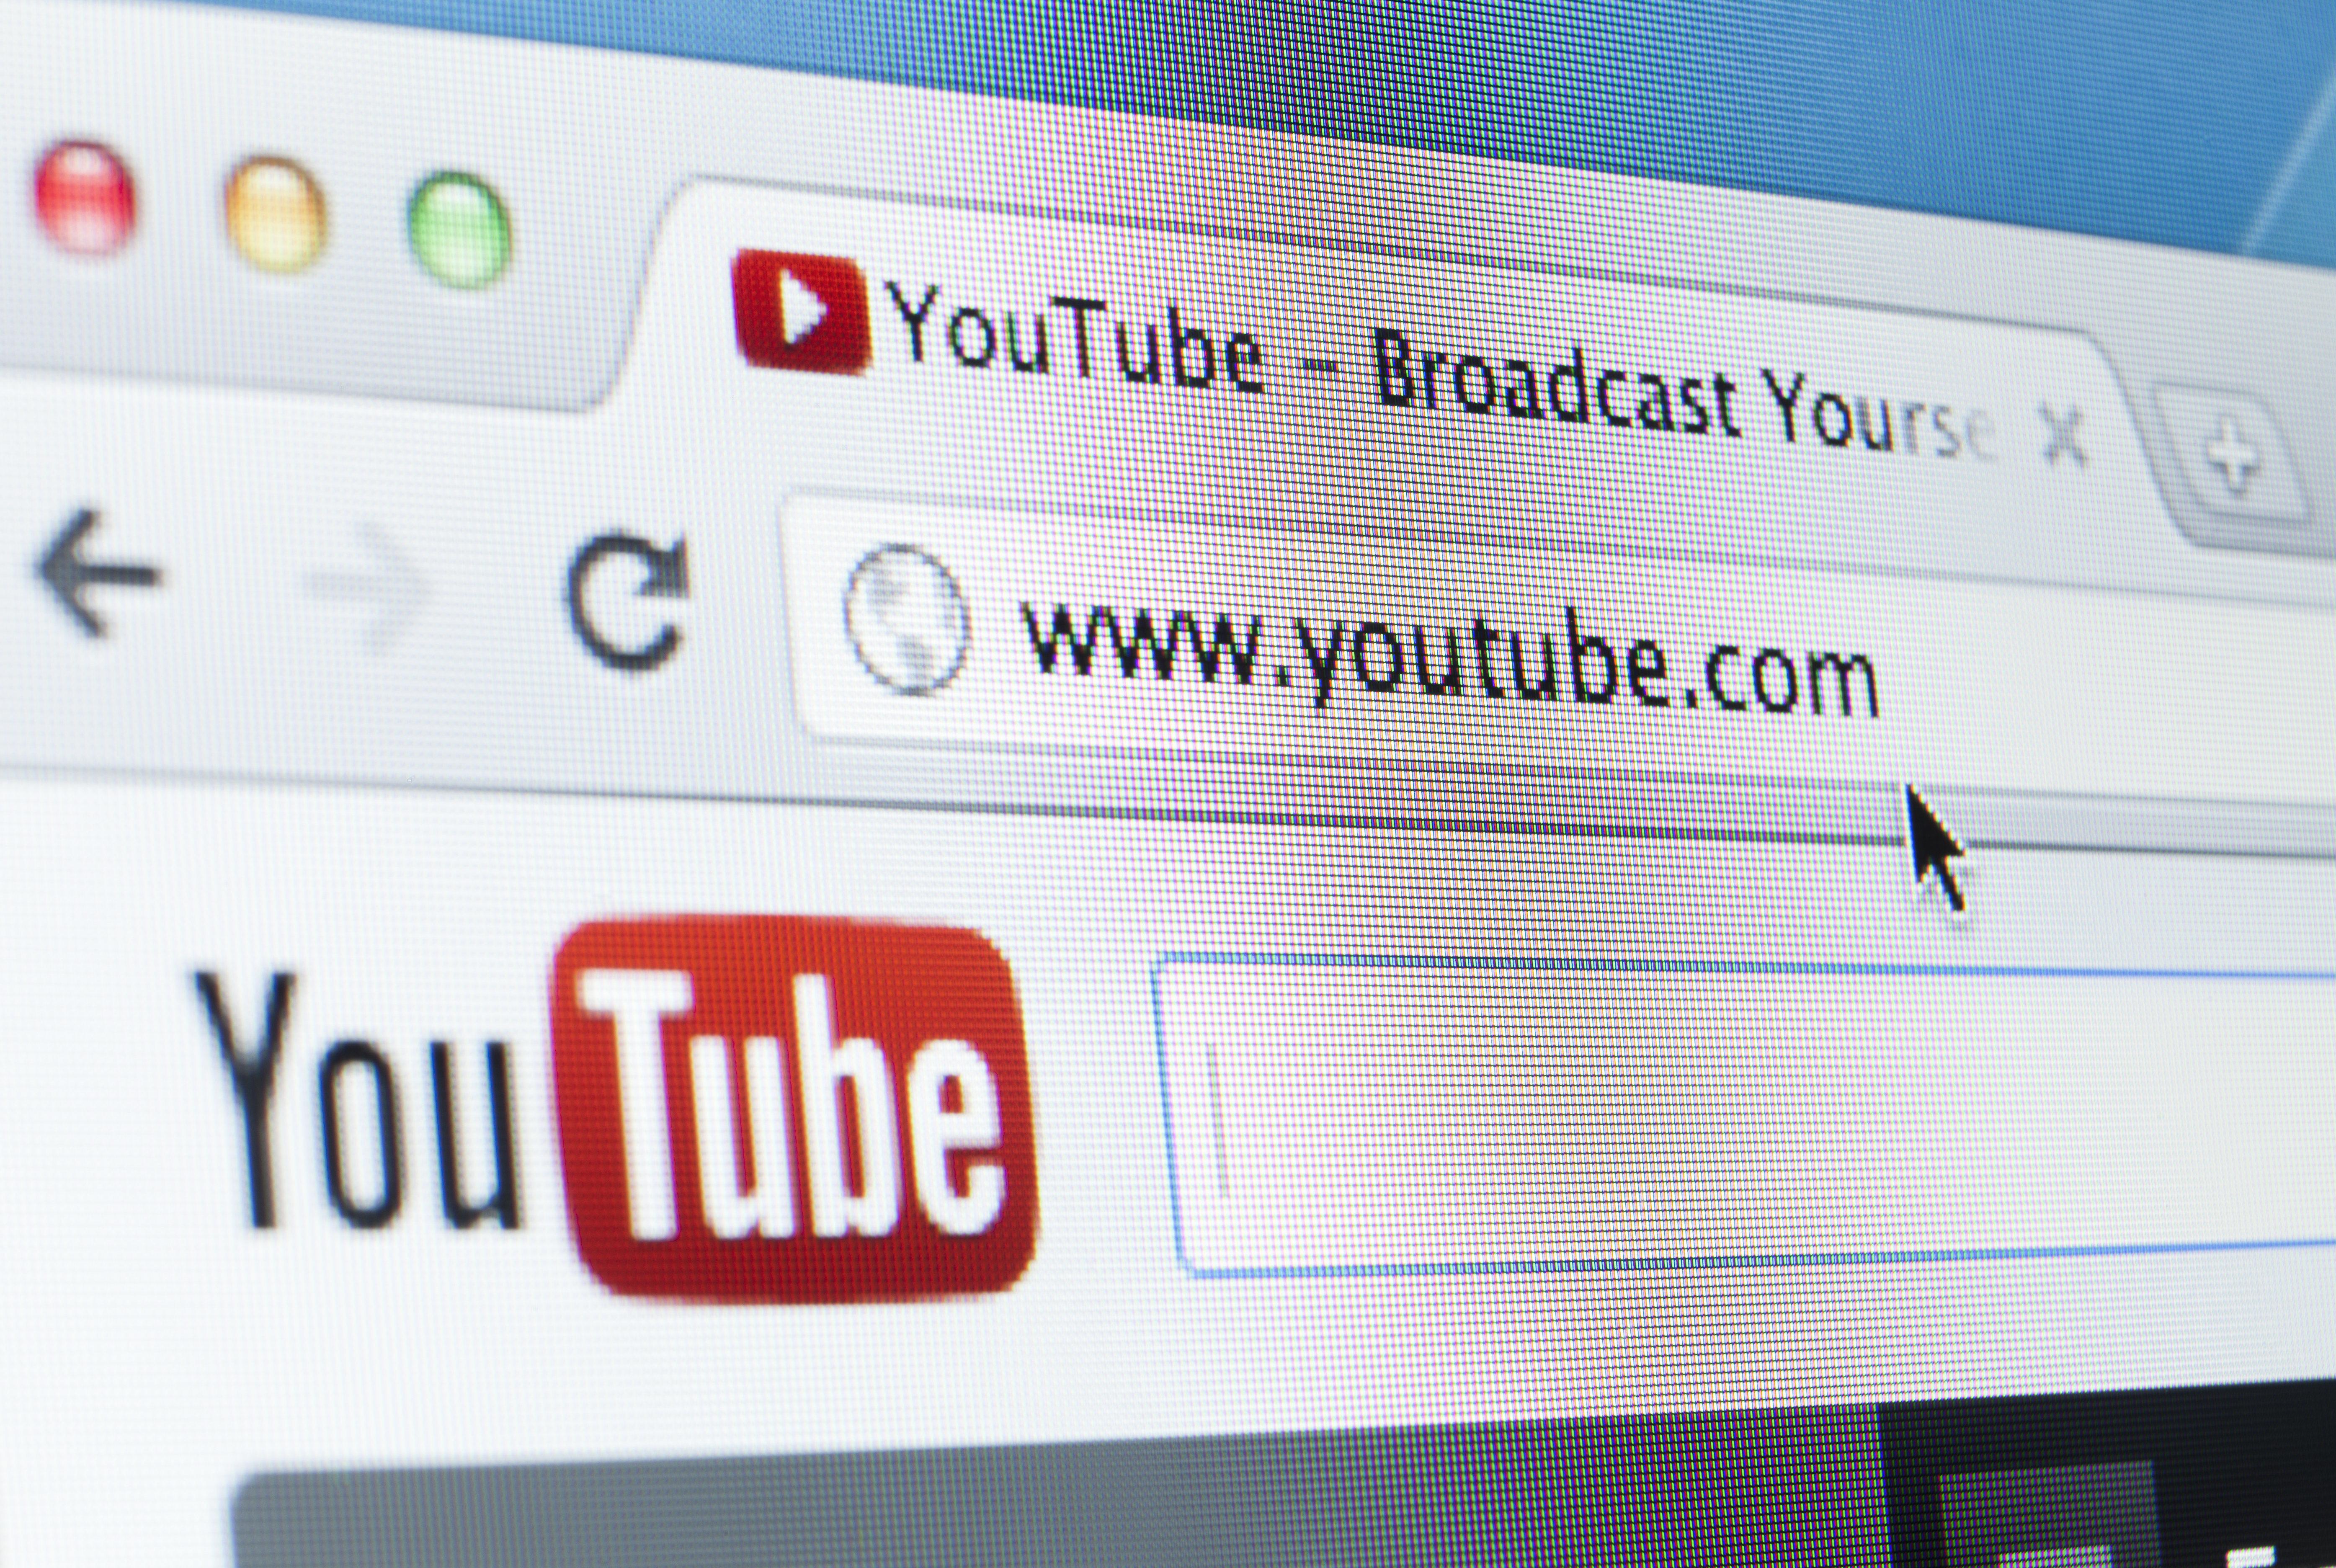 Man Praises YouTube's Crackdown On Conspiracy VideosHe Once Promoted